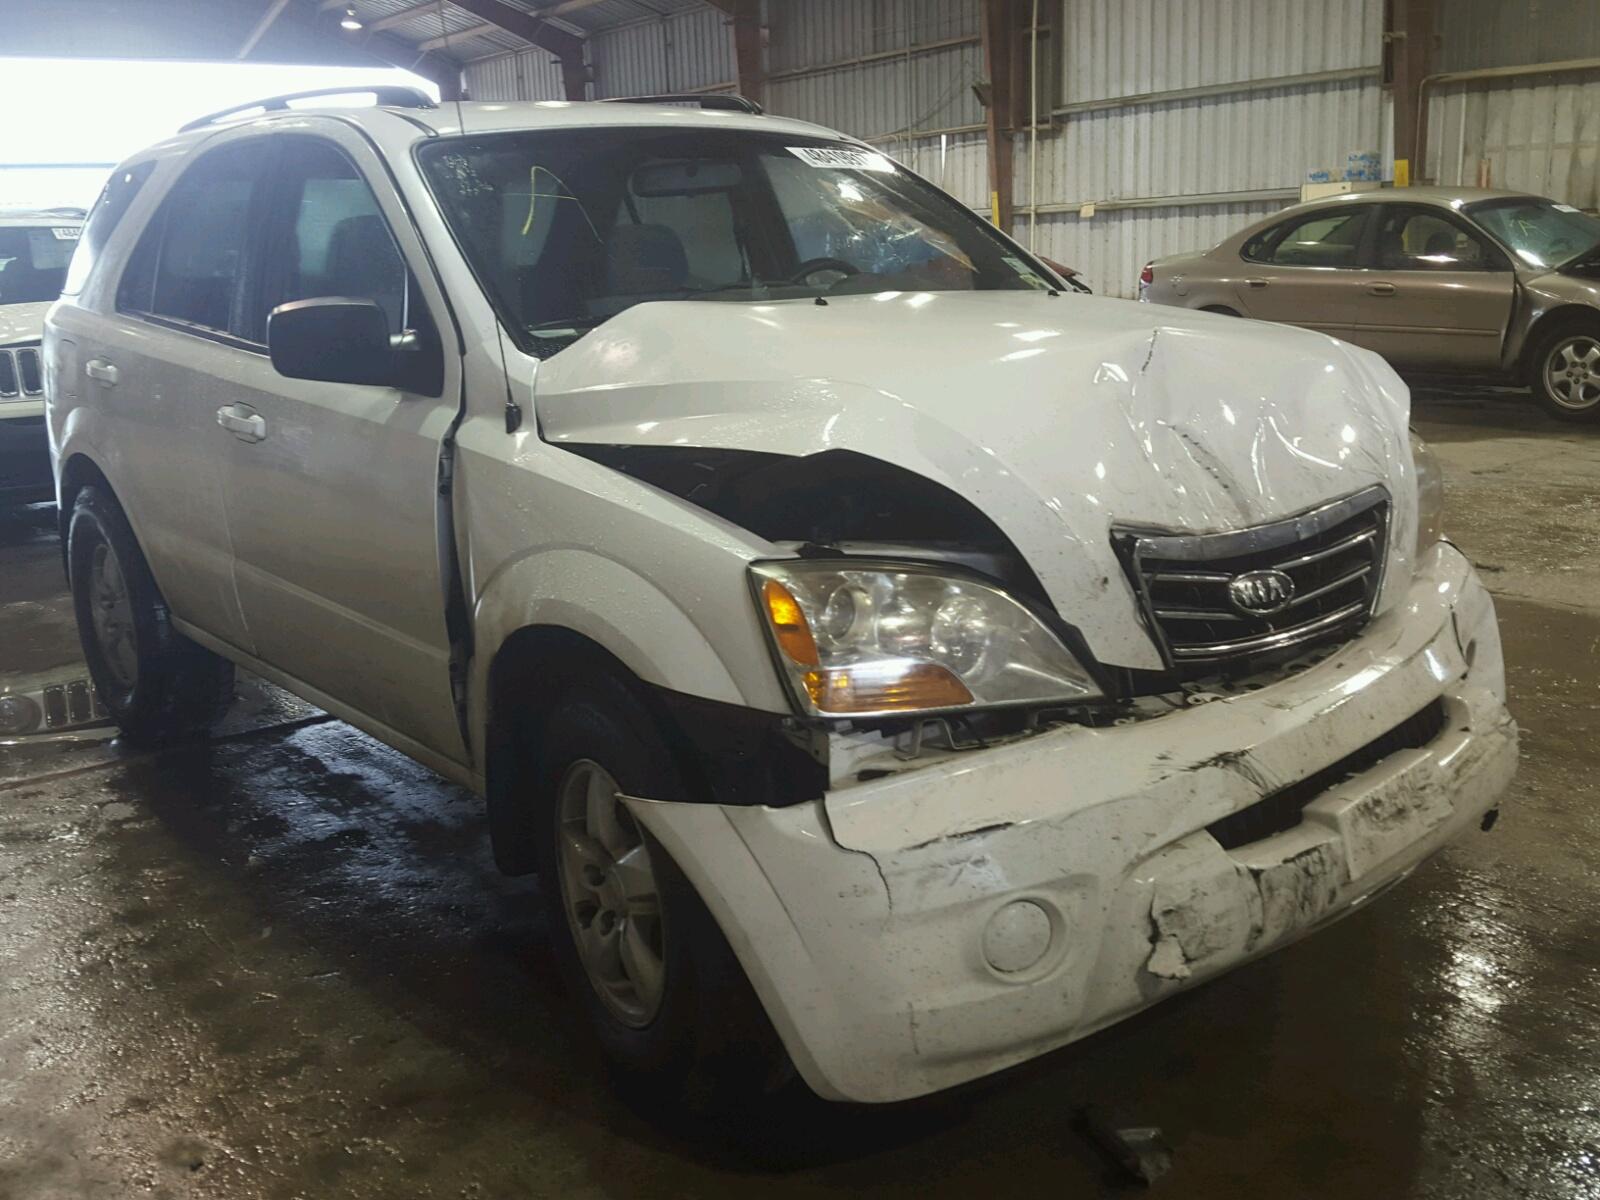 sale salvage baton la auto online brown en auctions copart left in vehicle kia carfinder lot view soul on rouge of title